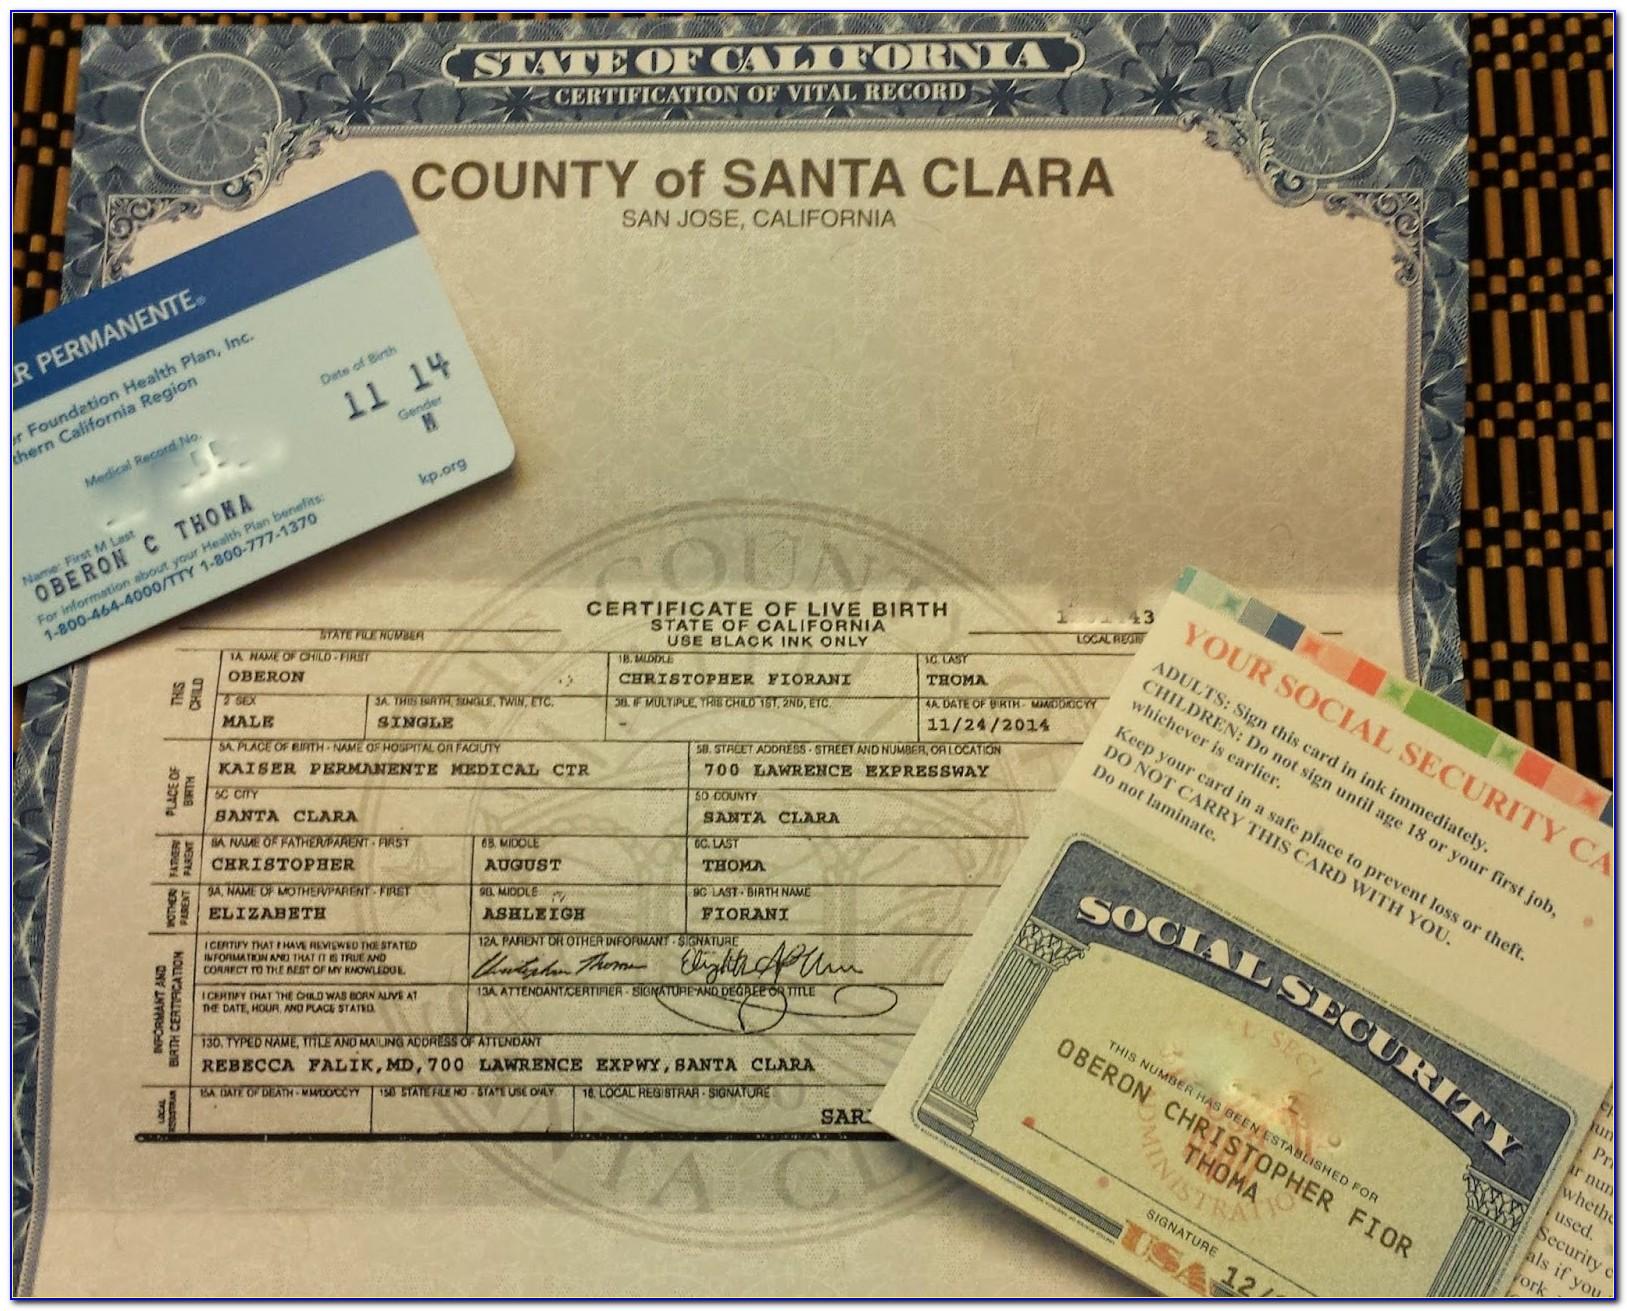 Santa Clara County Birth Certificate Copy